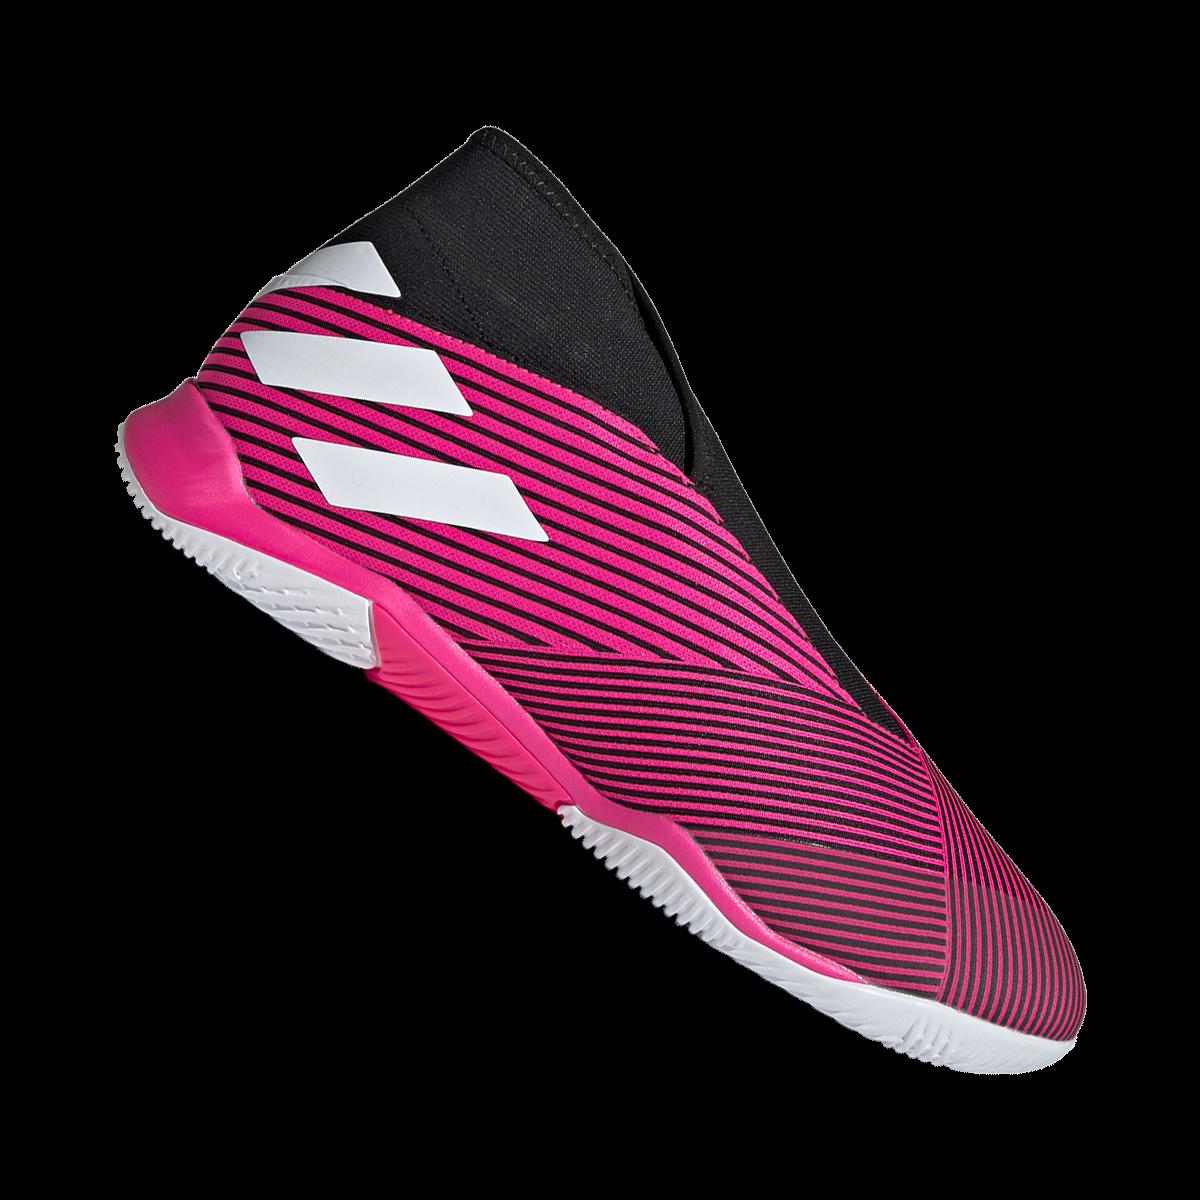 adidas Hallenschuh Nemeziz 19.3 LL IN pinkschwarz